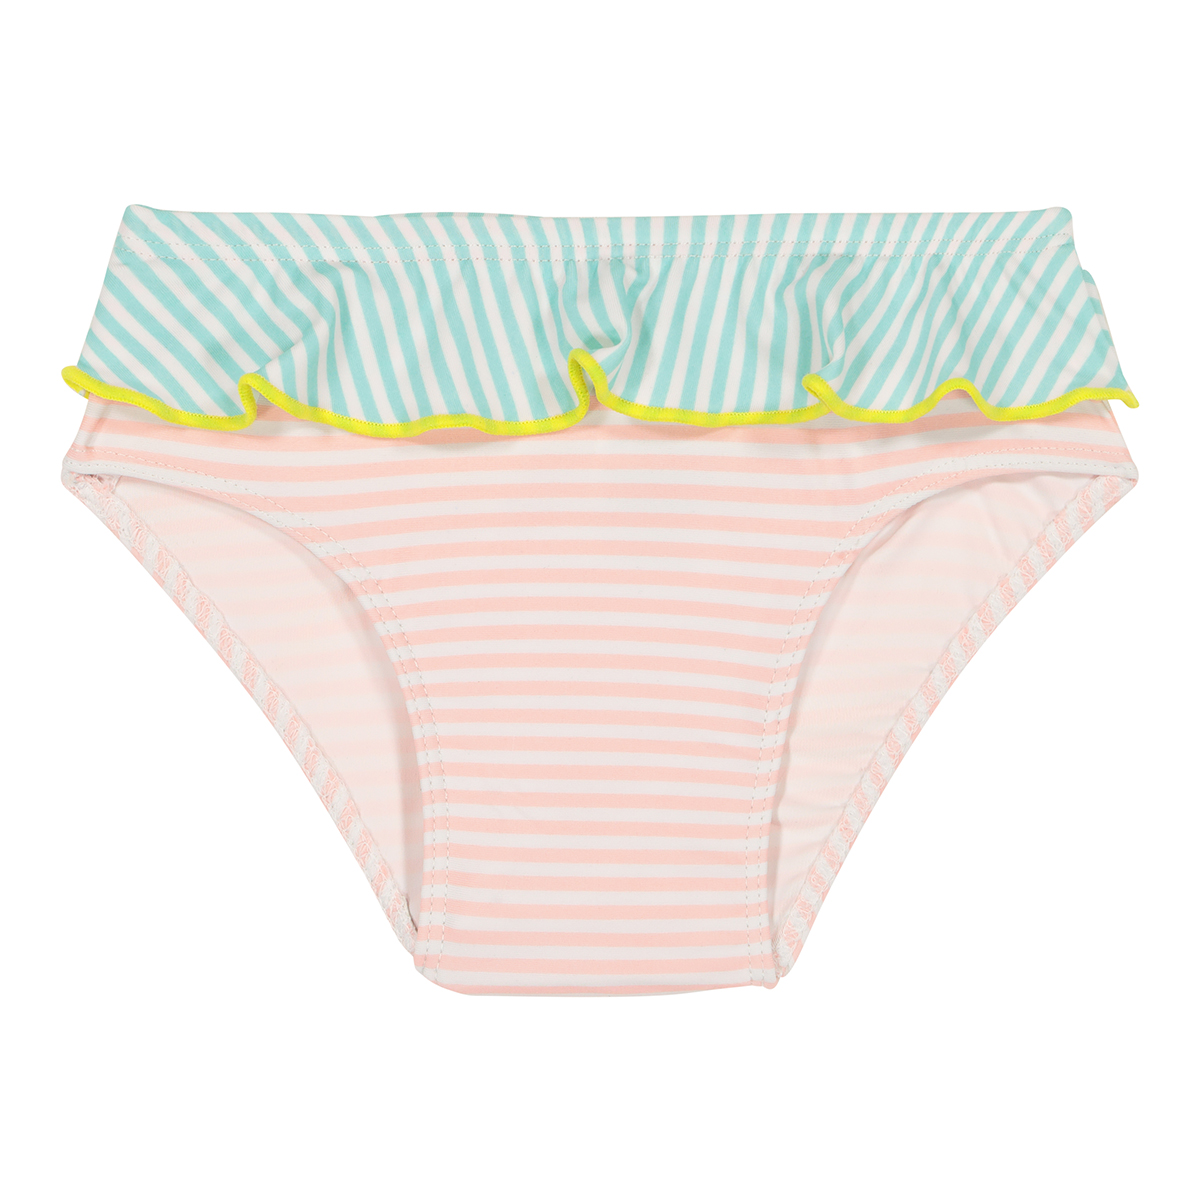 KiETLA Swim Anette Panties